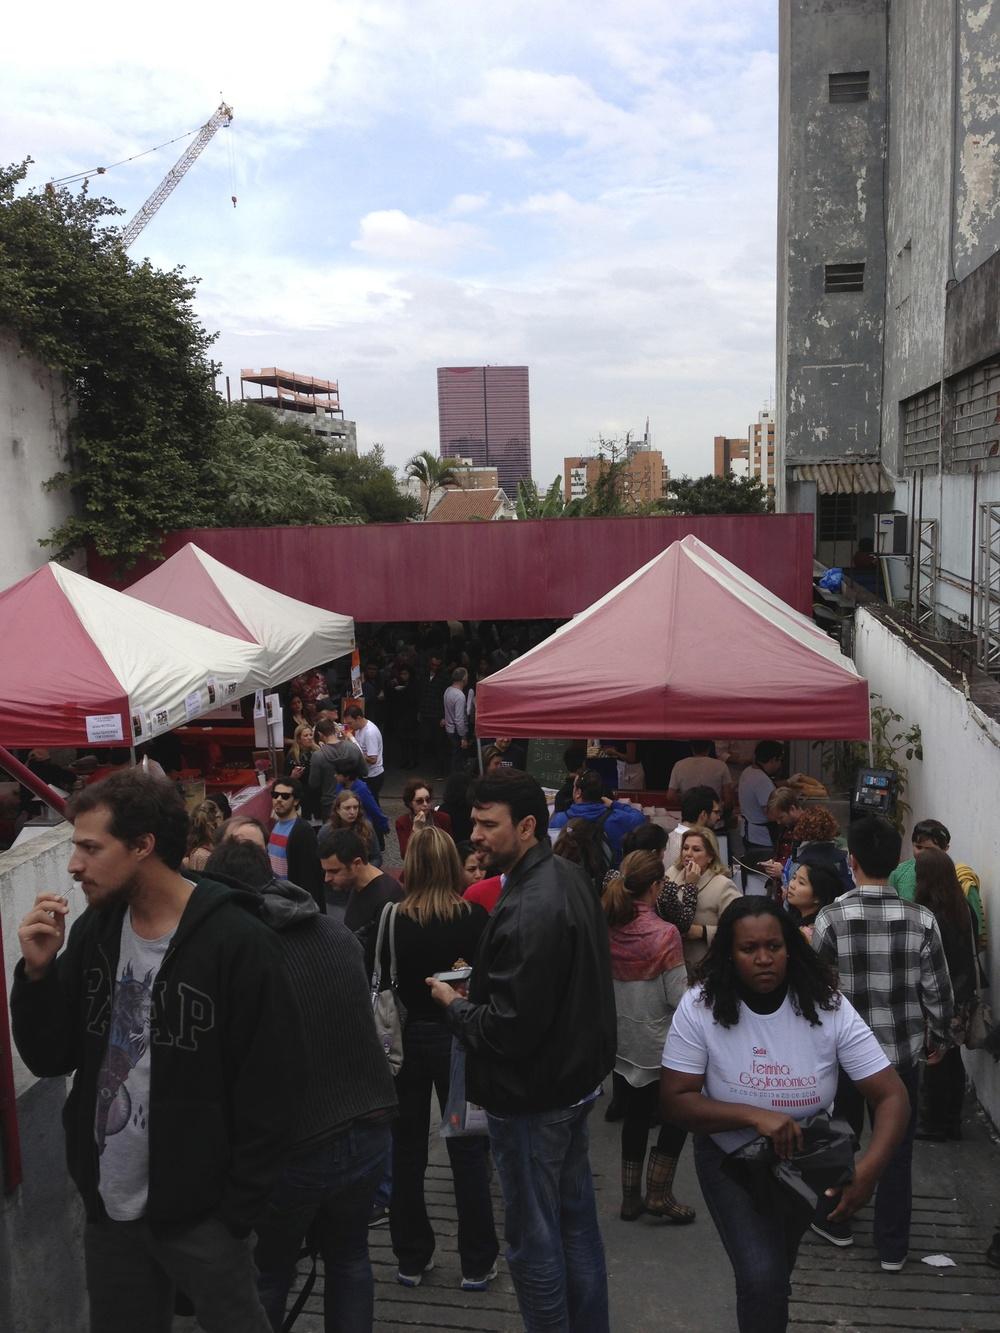 Sao Paulo's Street Food Festival